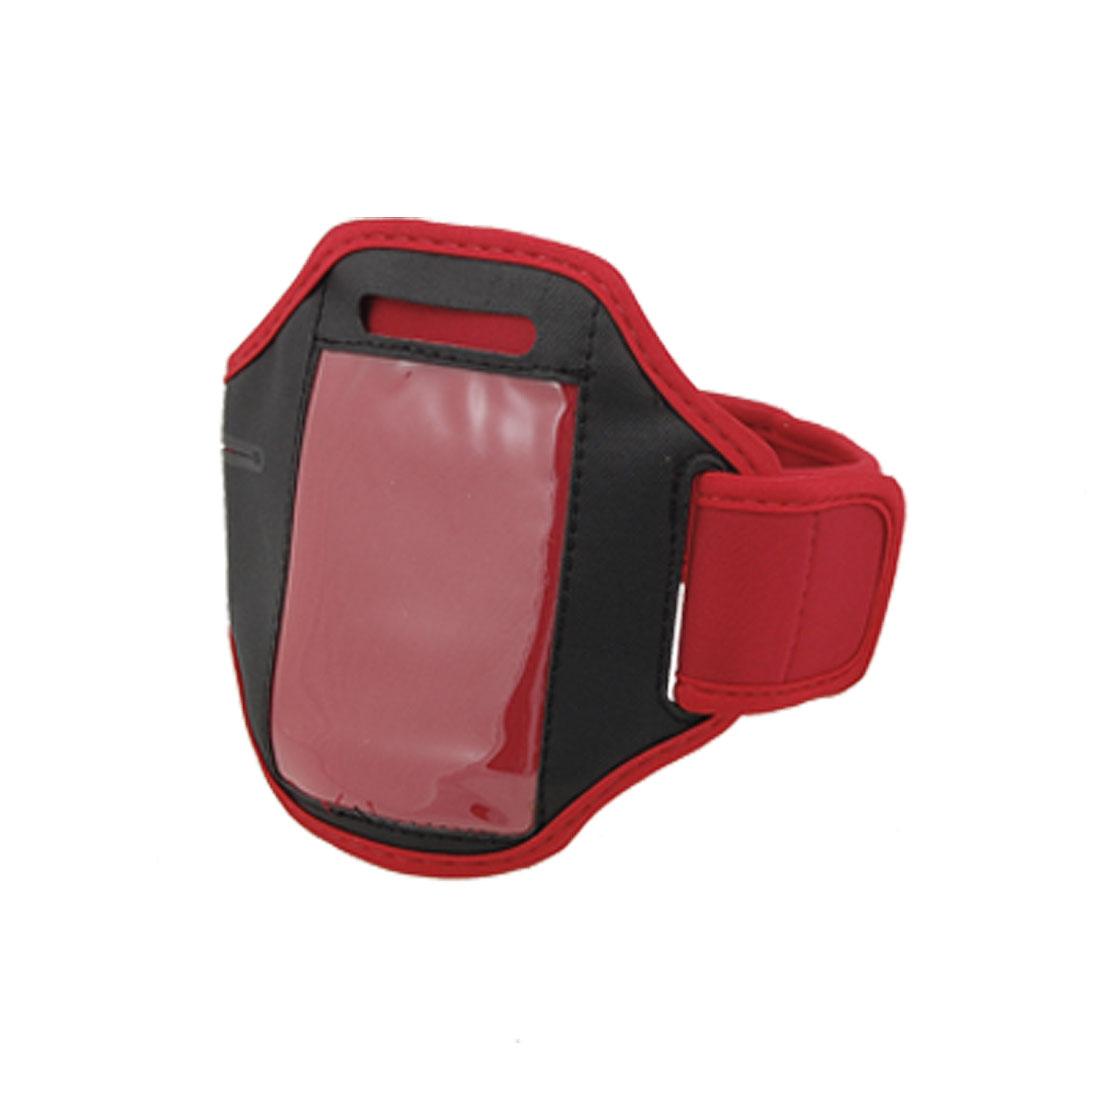 Black Red Adjustable Neoprene Armband Holder for iPhone 4